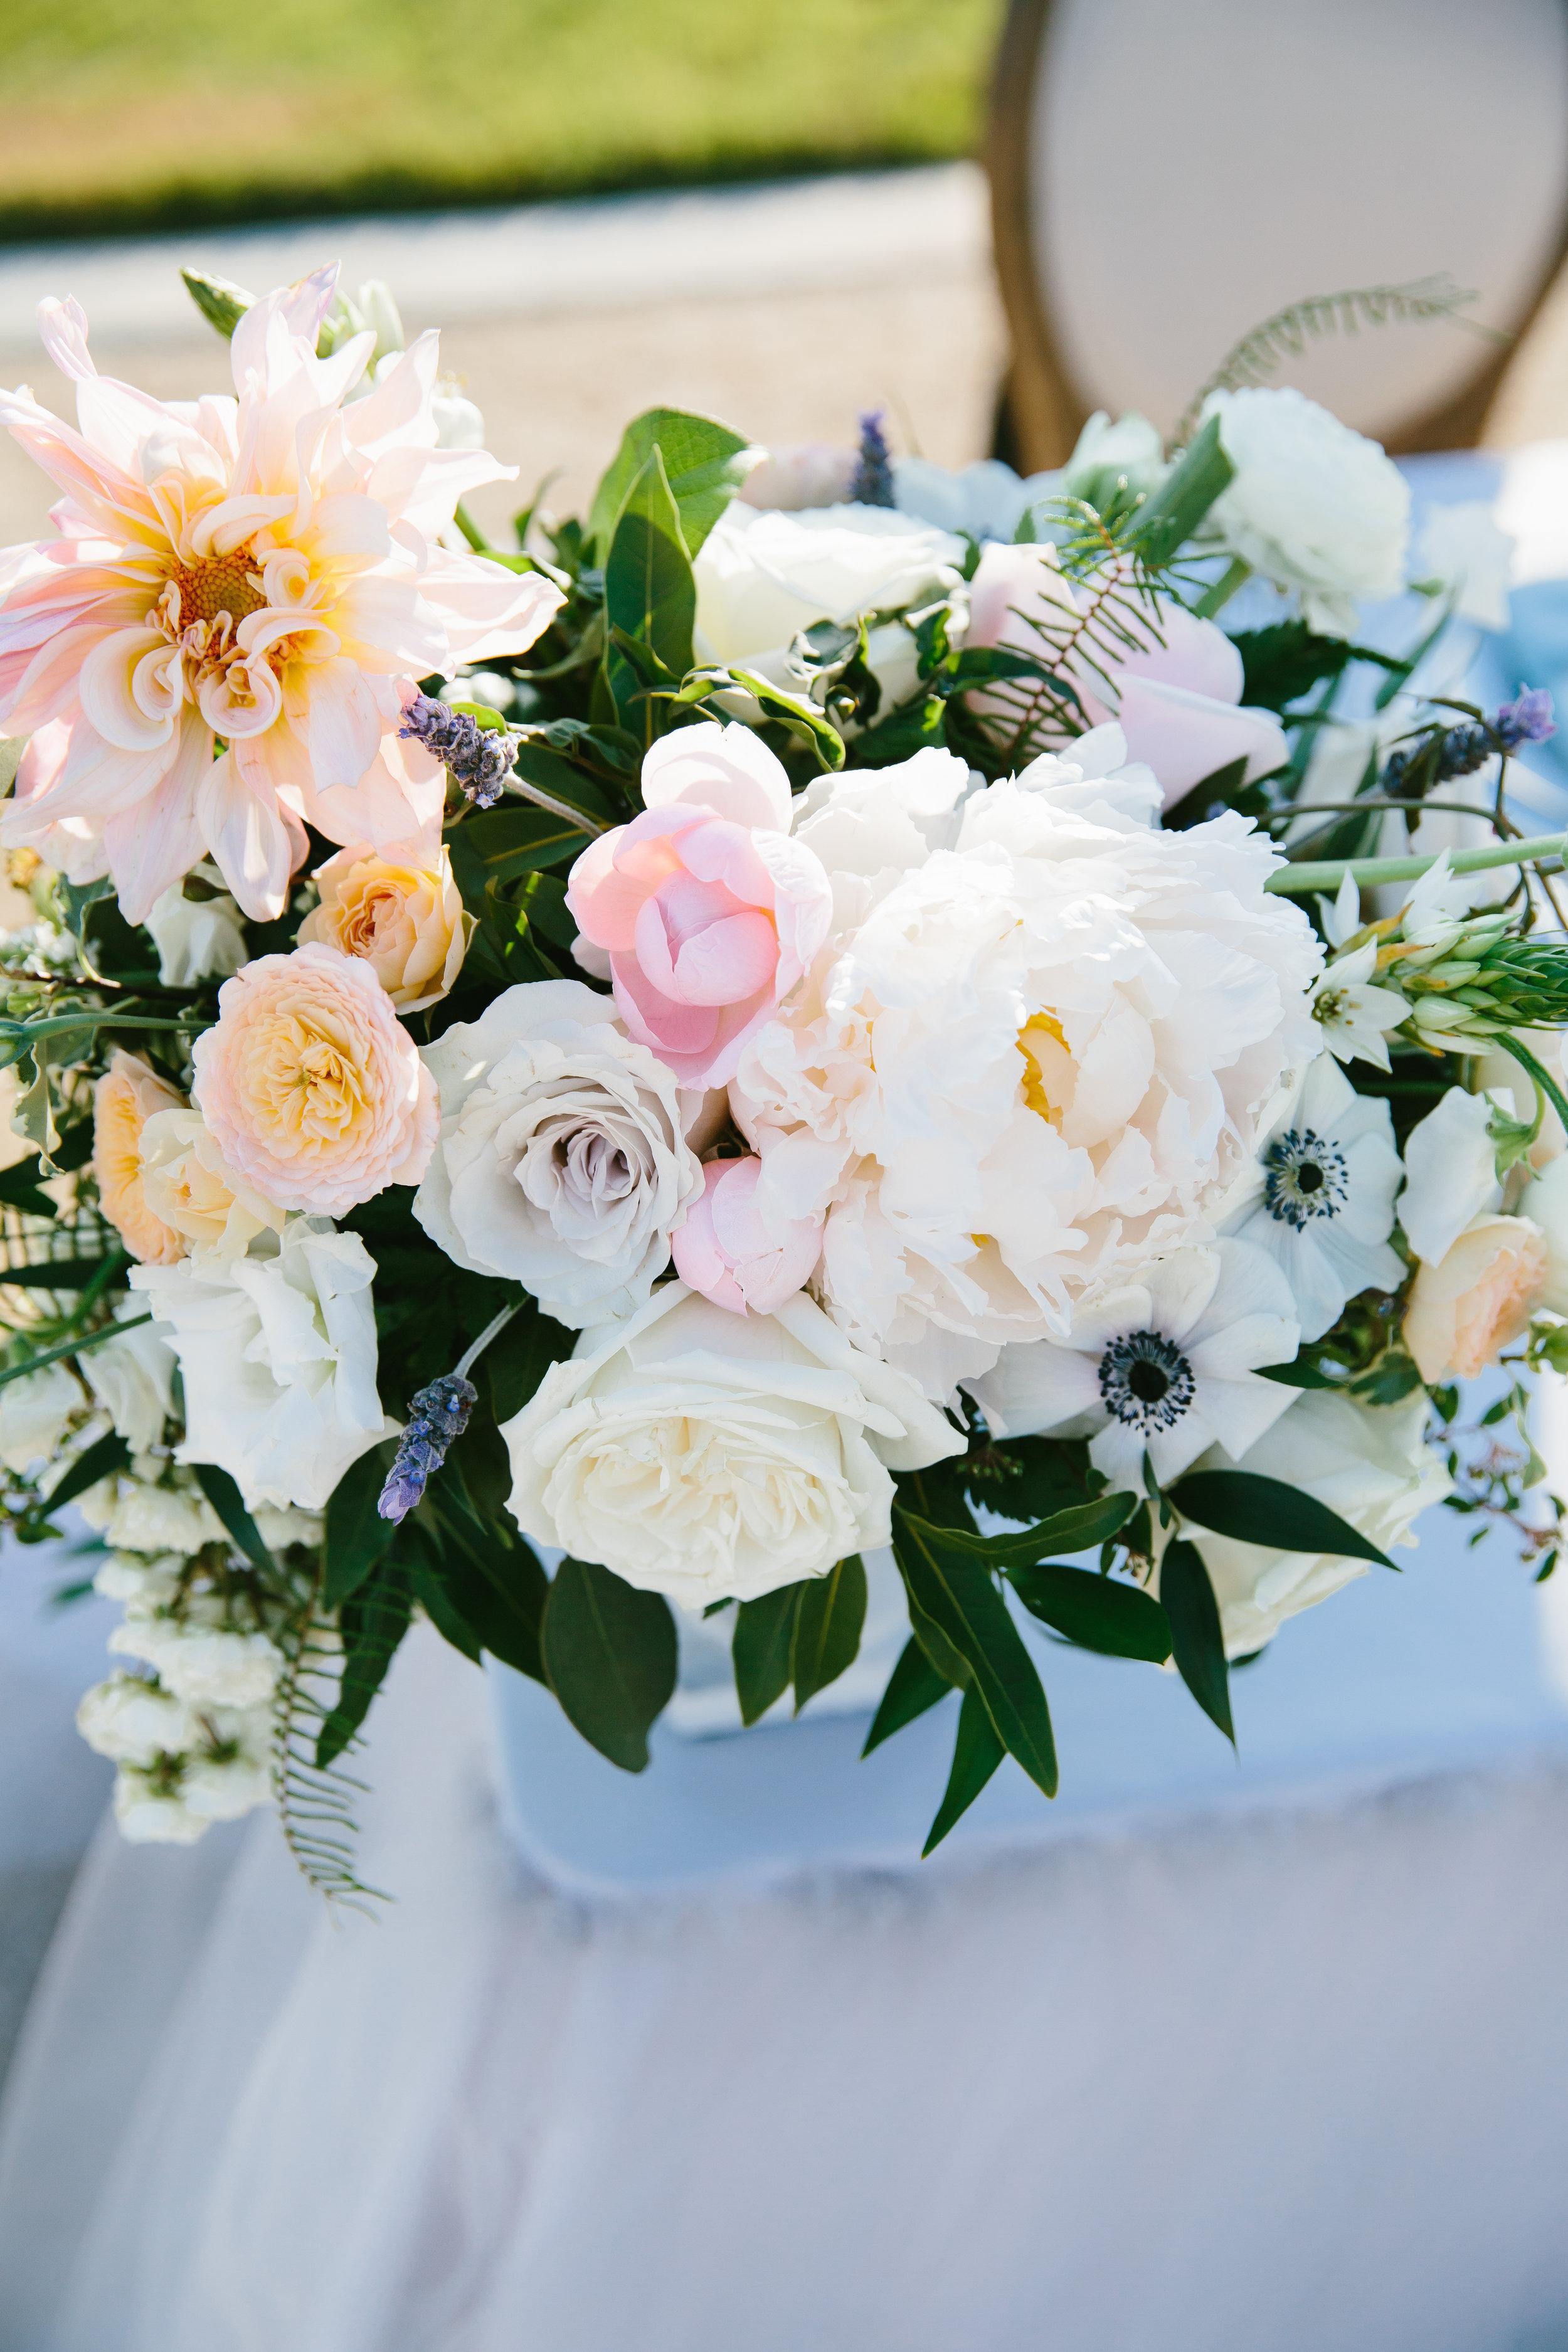 Violette-fleurs-event-design-roseville-anna-perevertaylo-rancho-robles-vinyards-Flowers-Destination-Decor-Florist-sweetheart-table.jpg